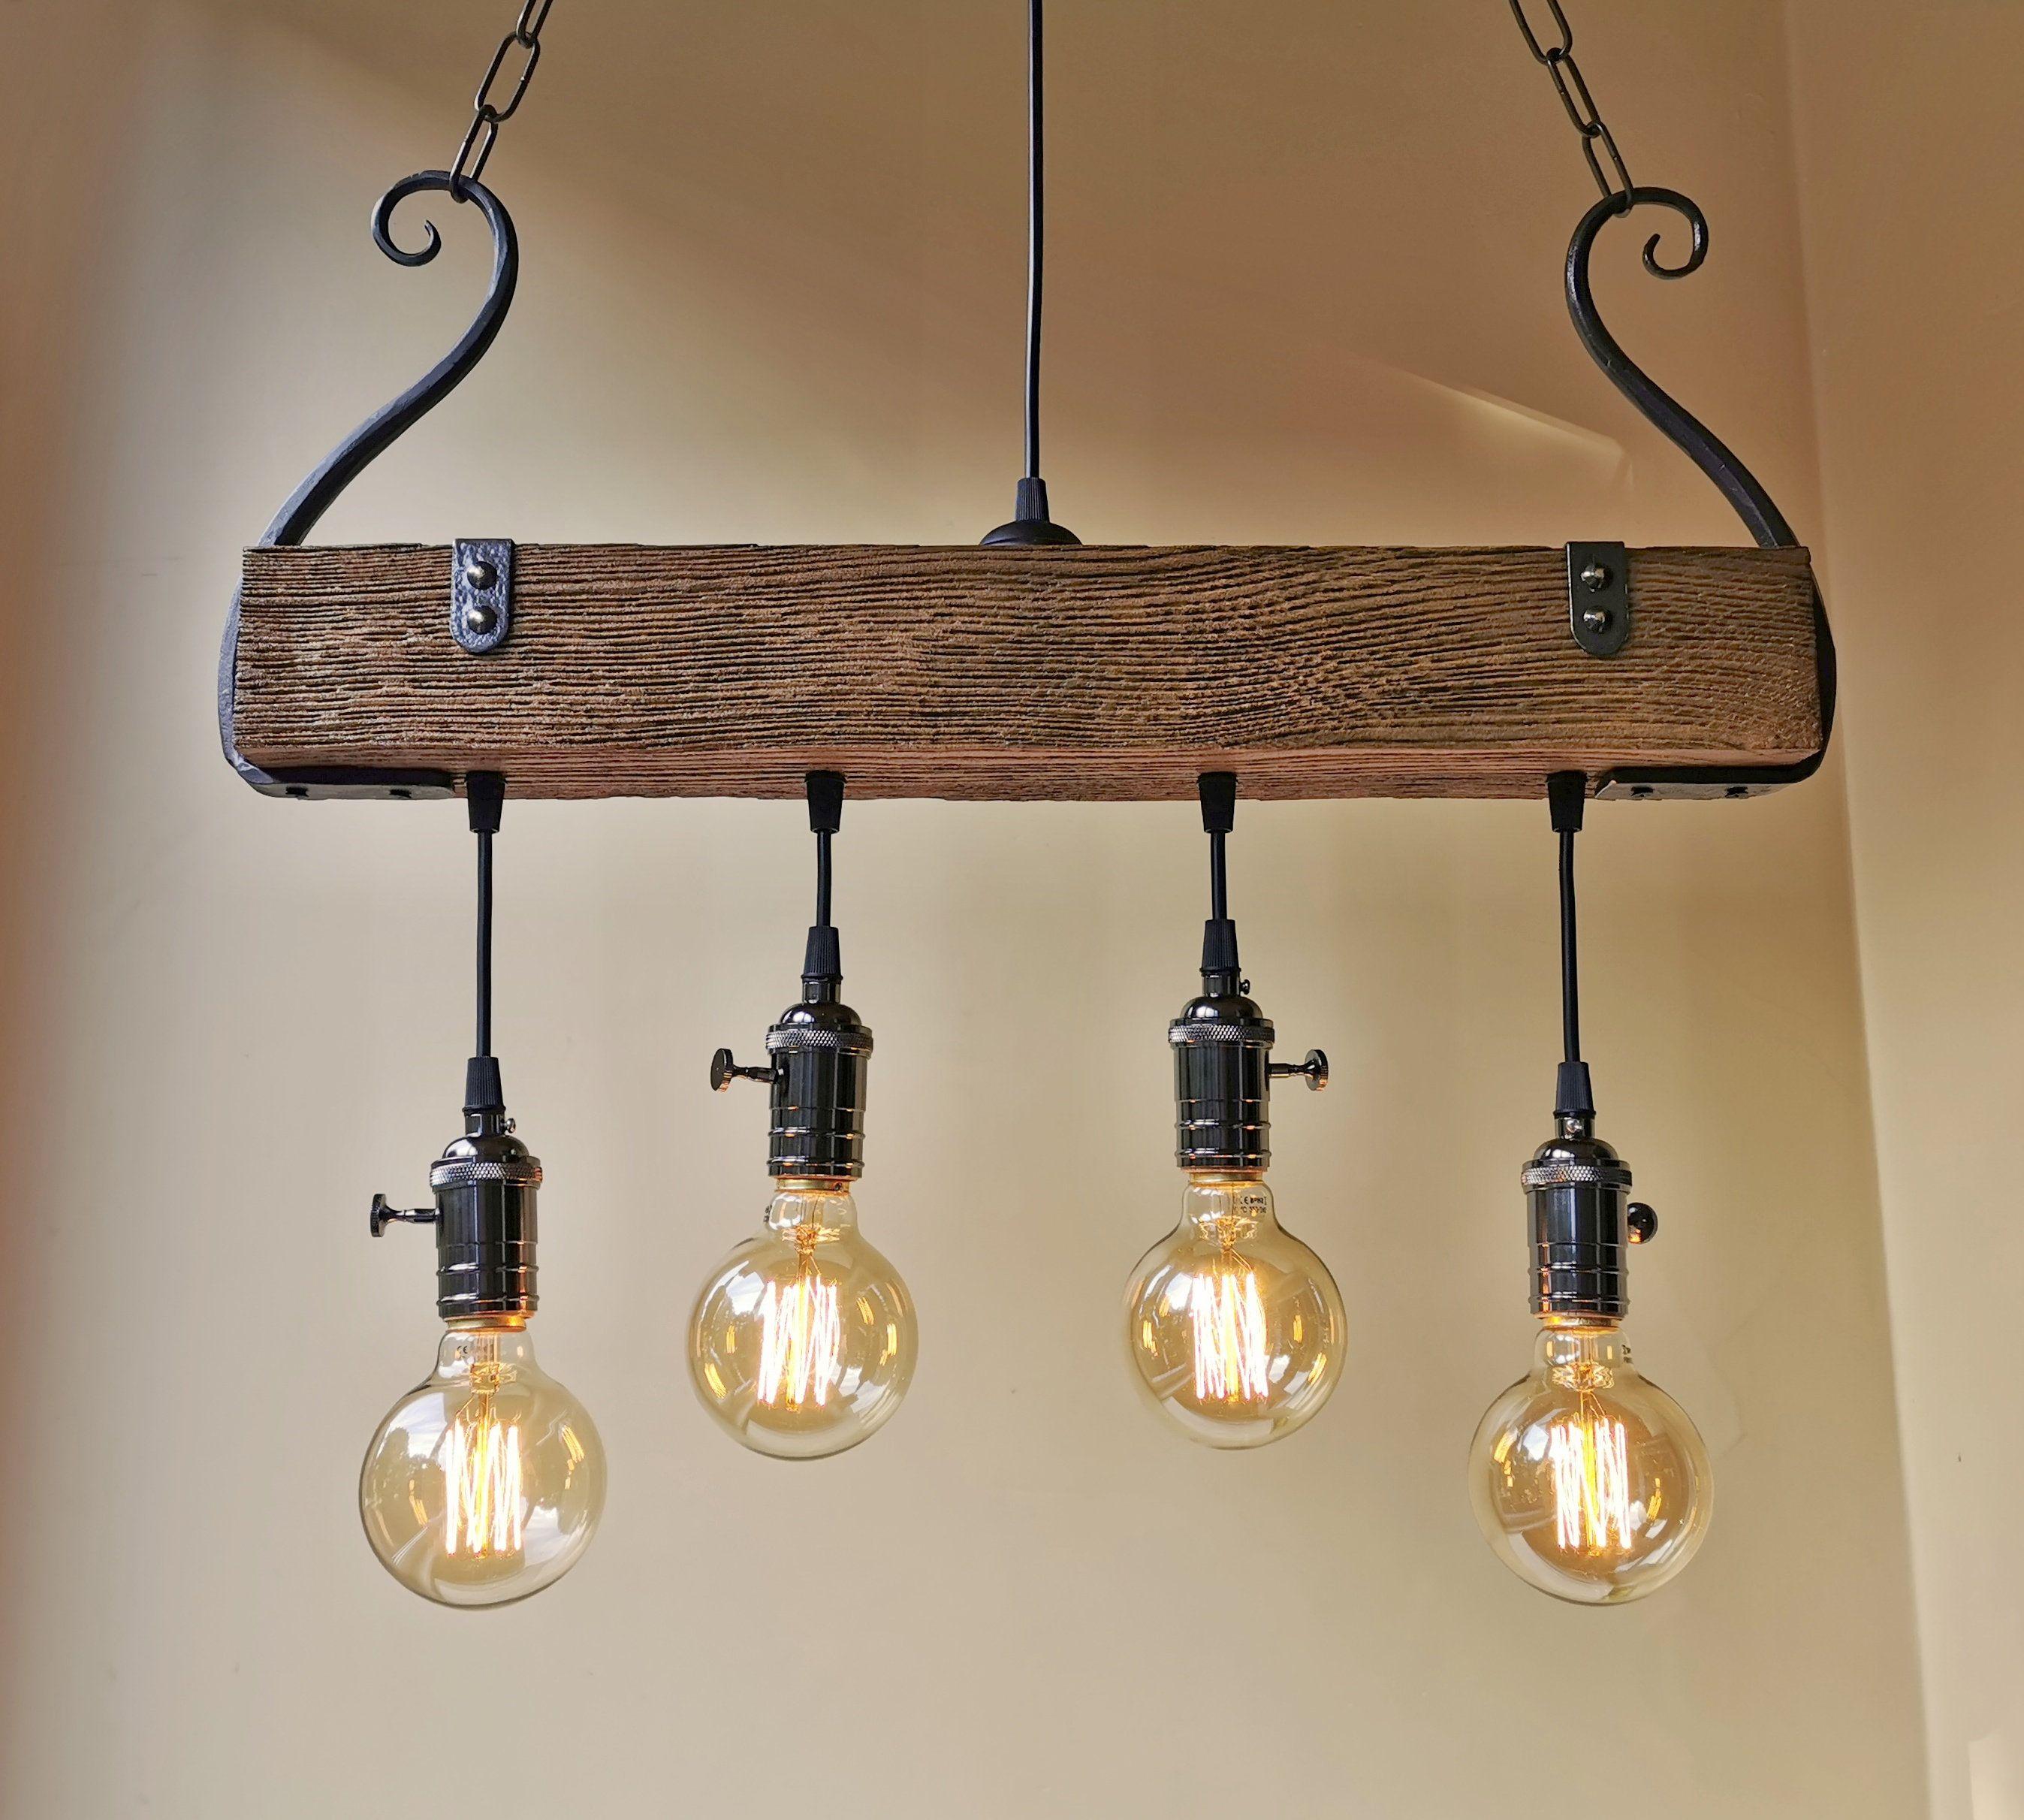 Rustic Lighting Wood Chandelier Oak Chandelier Rustic Light